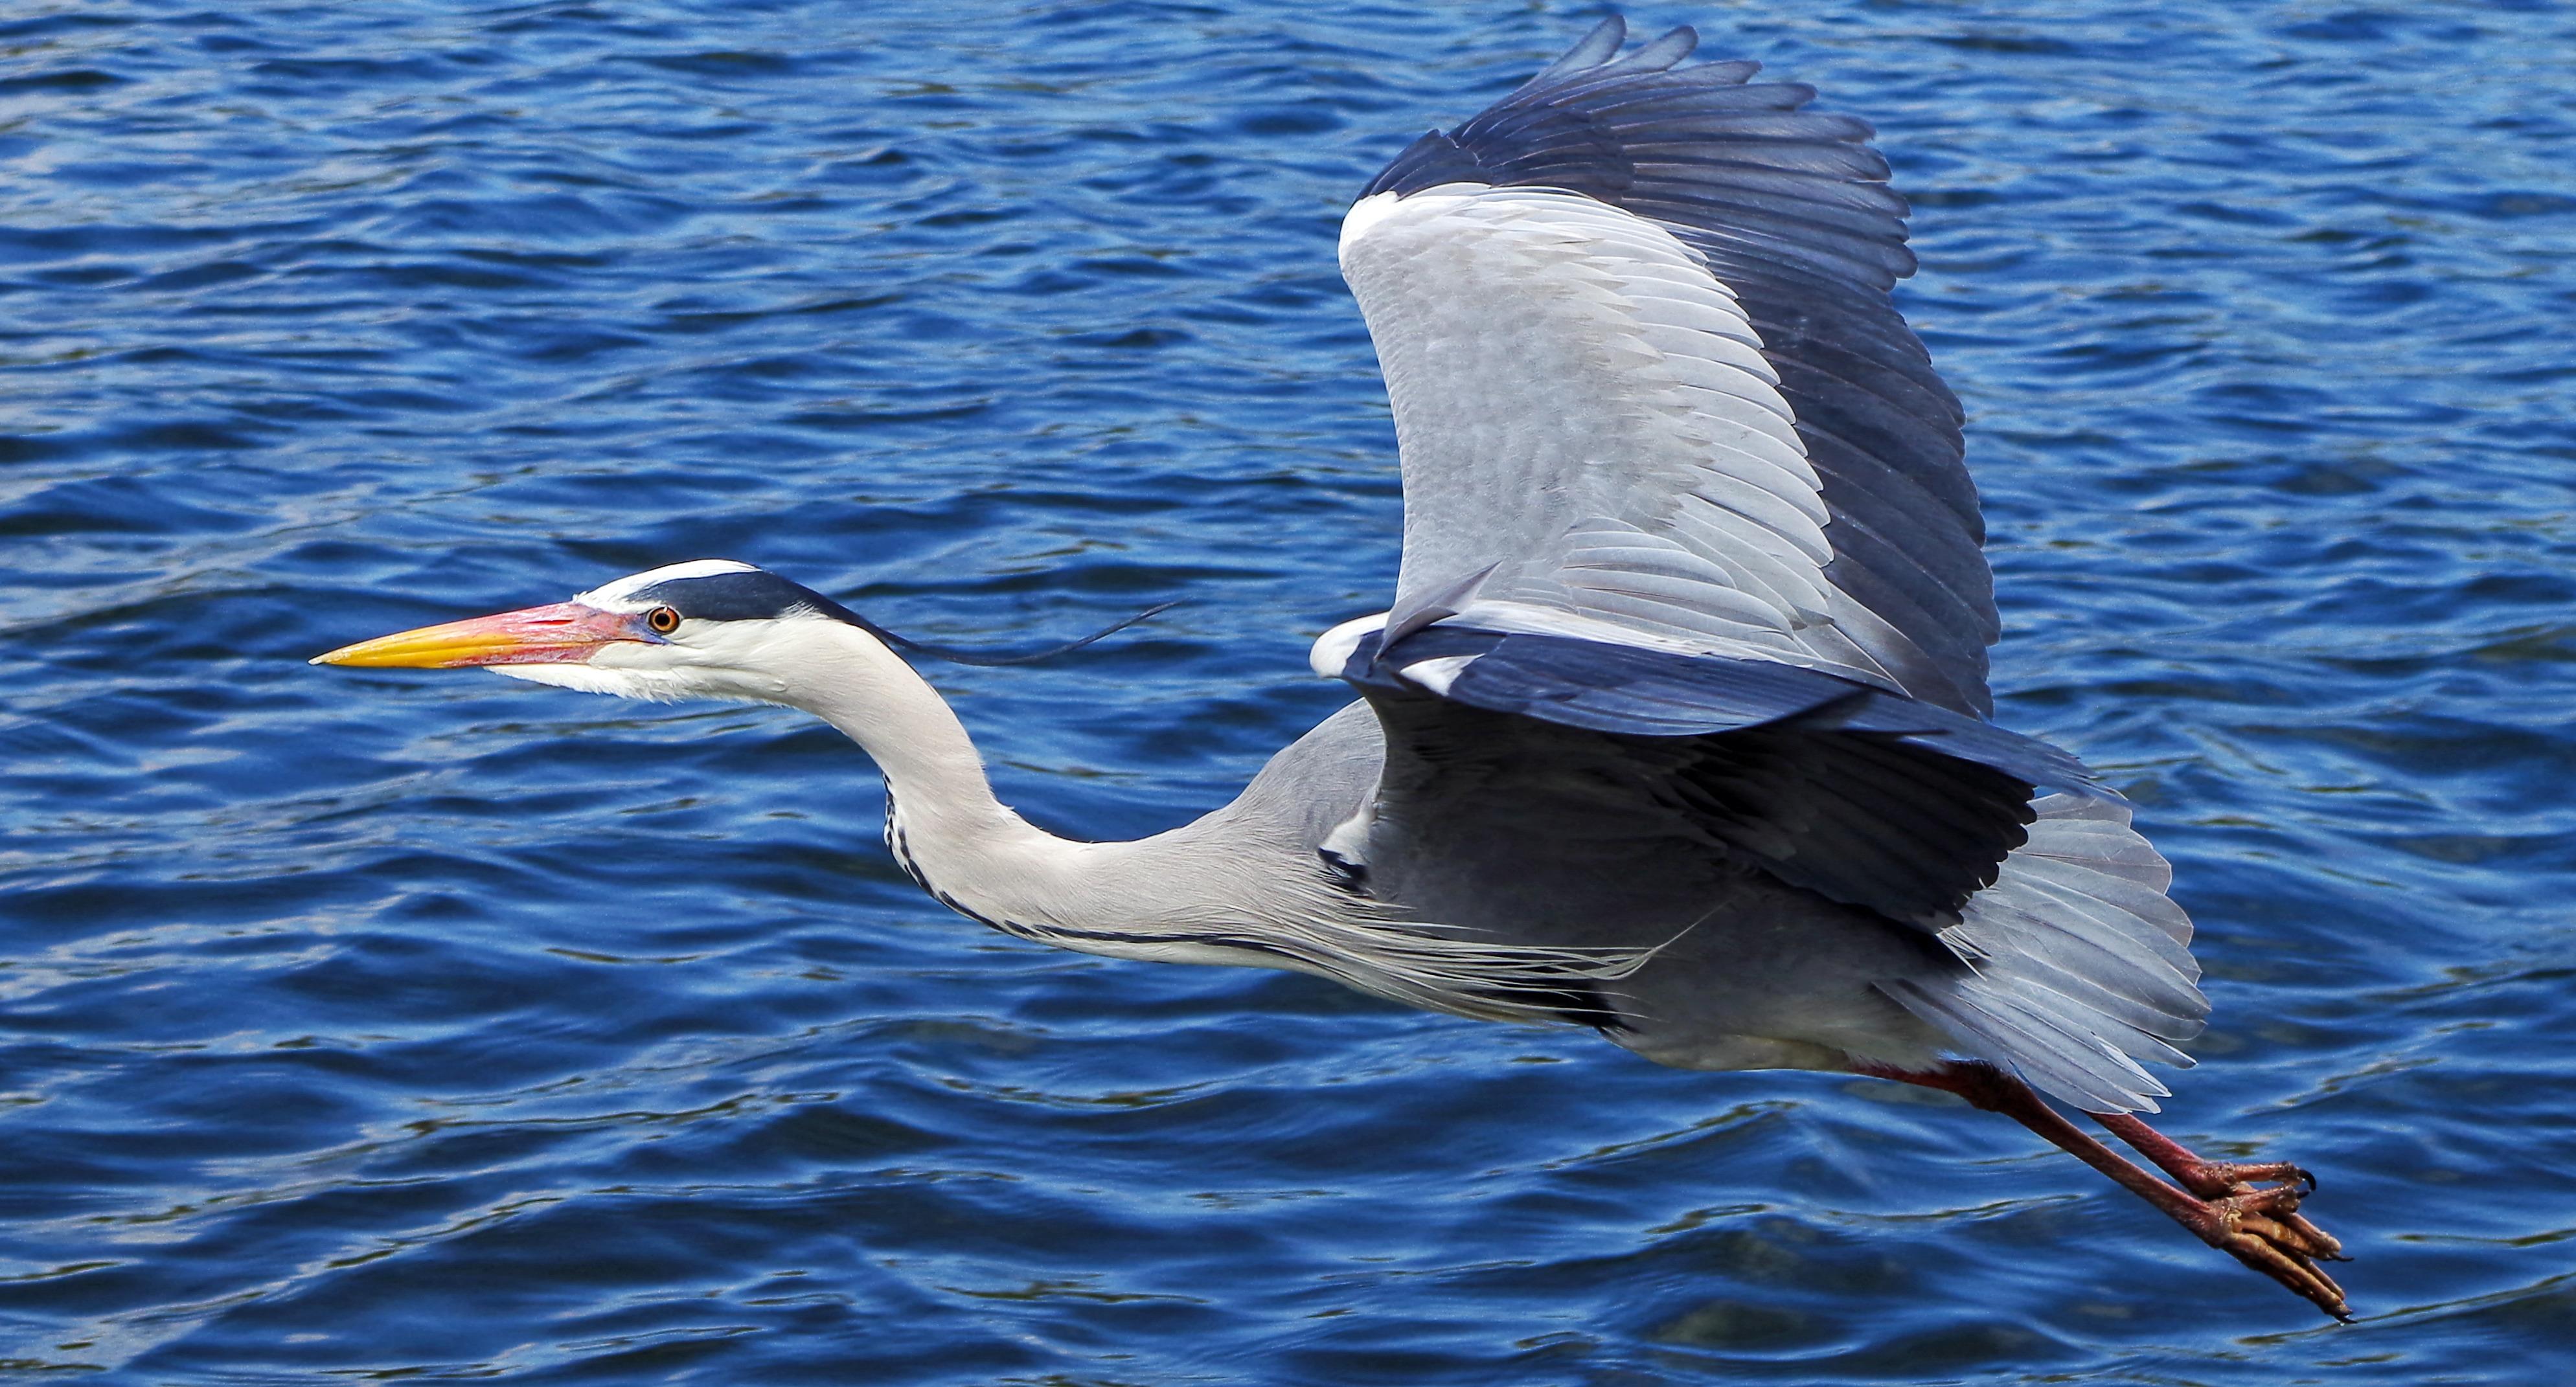 Grey Heron, Animal, Bird, Blue, Flow, HQ Photo